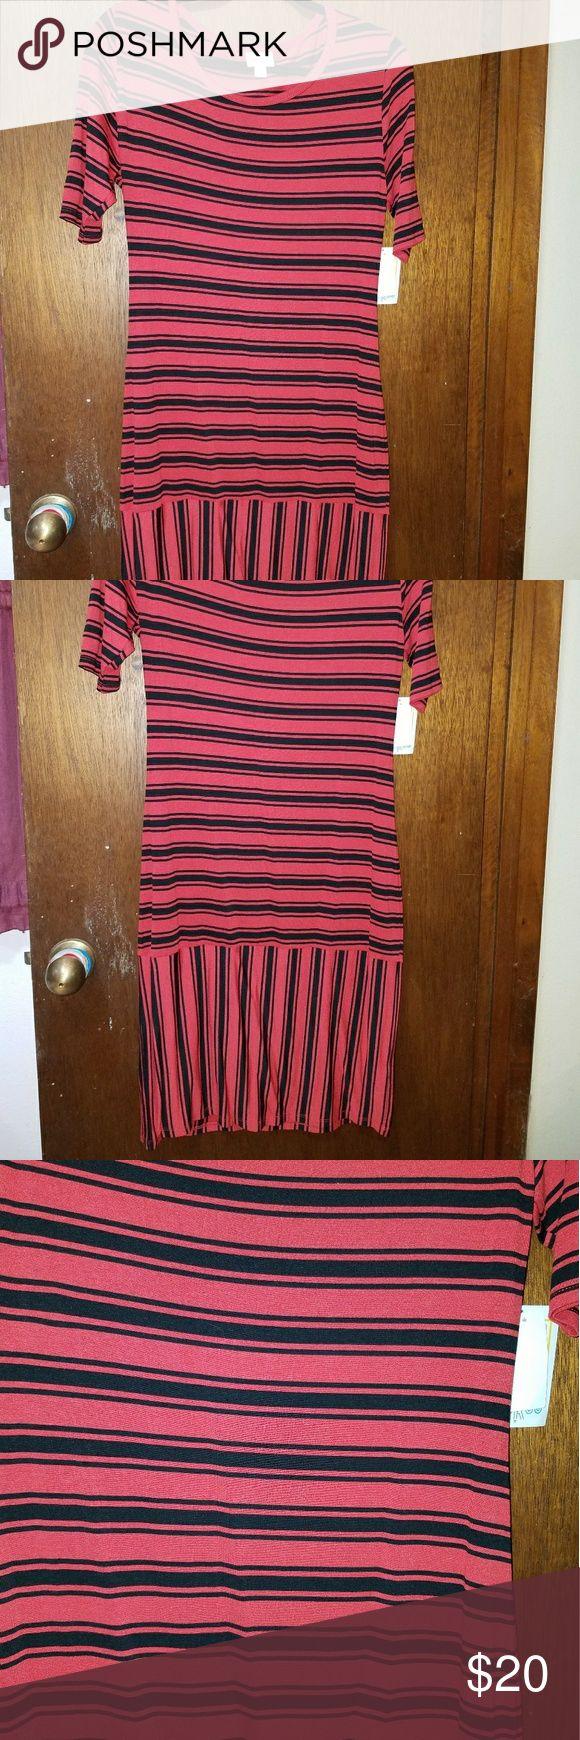 NWTS LuLaRoe Julia dress NWTS LuLaRoe Julia  Size large Soft and stretchy  Red and black stripes horizontal and vertical LuLaRoe Dresses